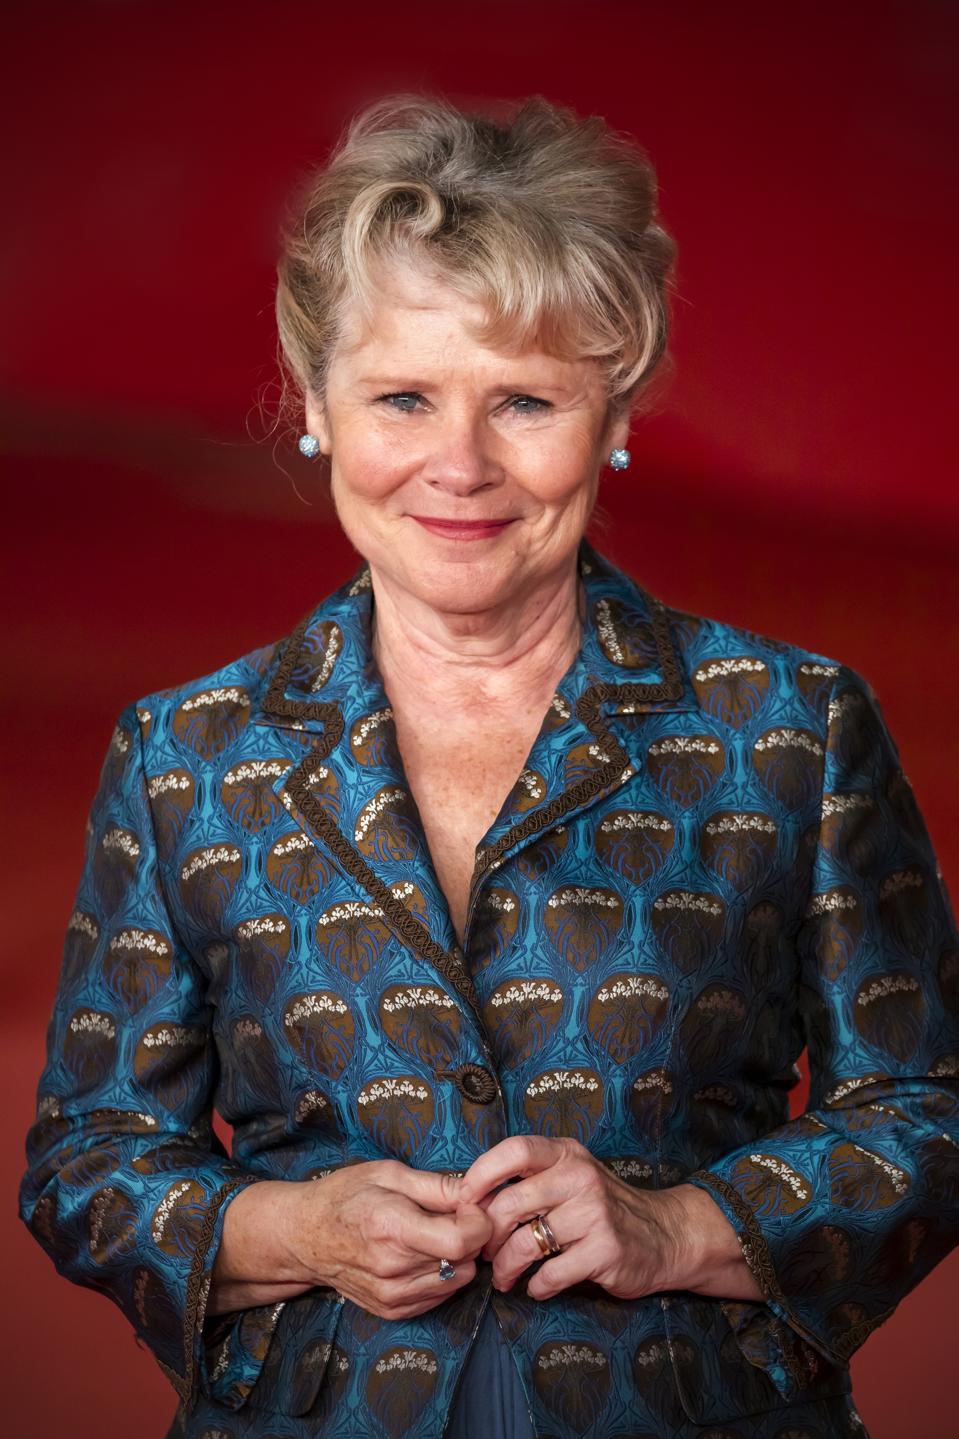 Imelda Staunton attends the '' Downton Abbey '' red carpet...